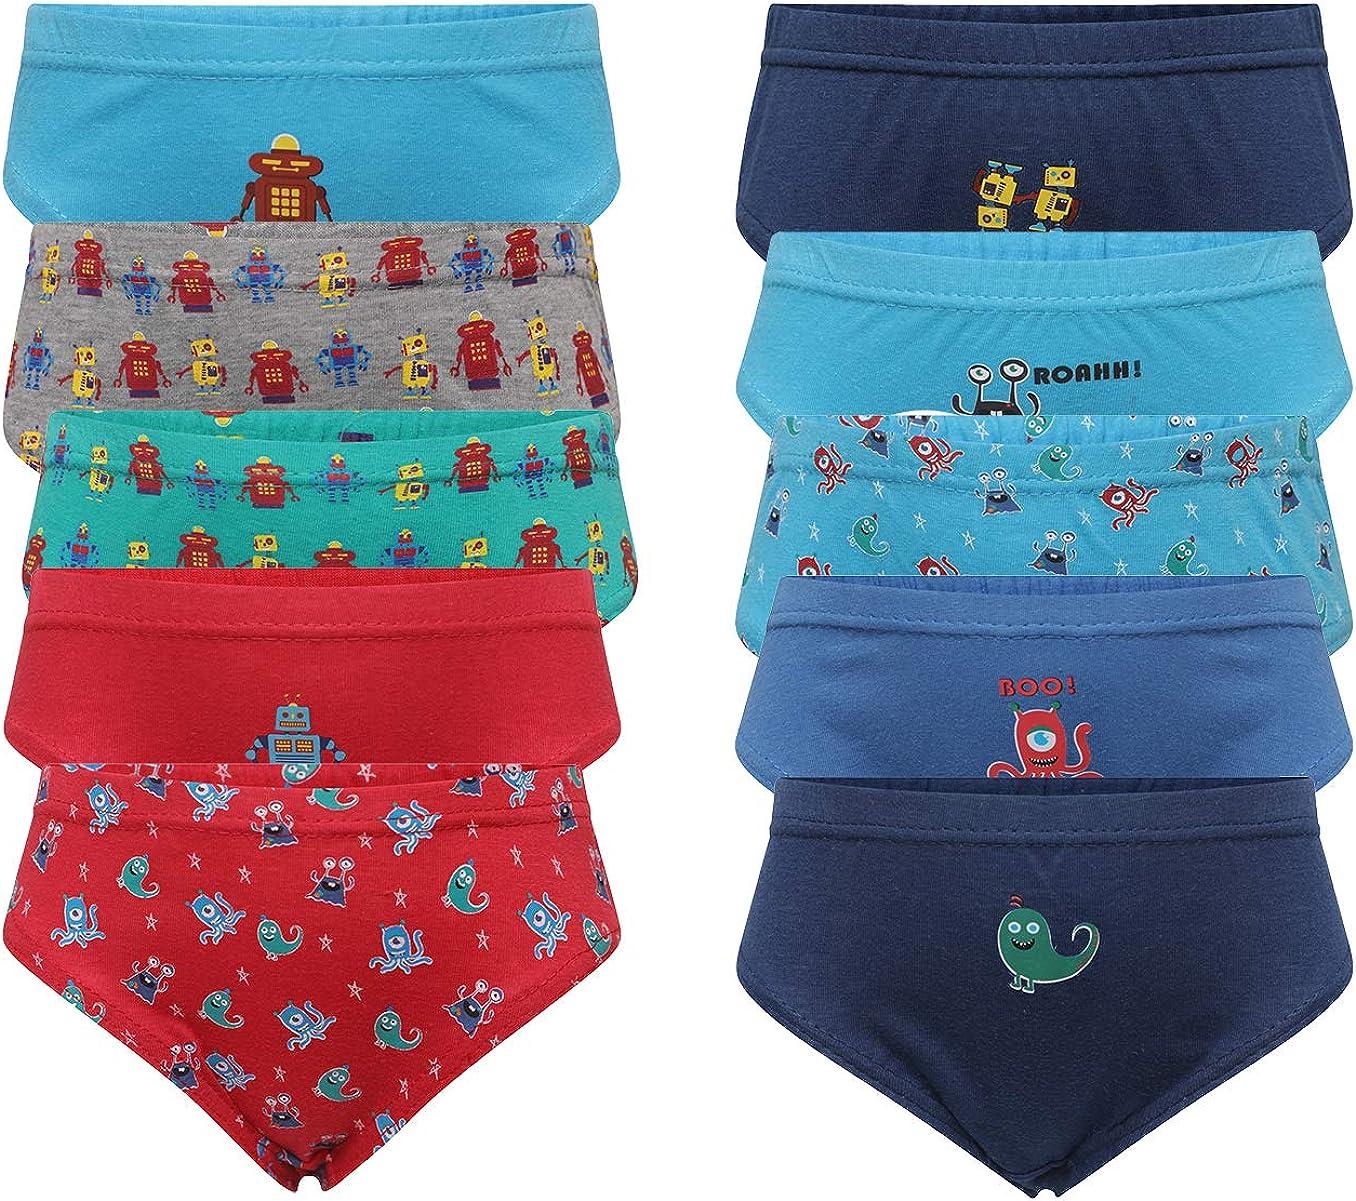 Hari Deals Boys Children 100% Cotton Briefs Underwear Slips Pants 10 Pack:  Amazon.co.uk: Clothing